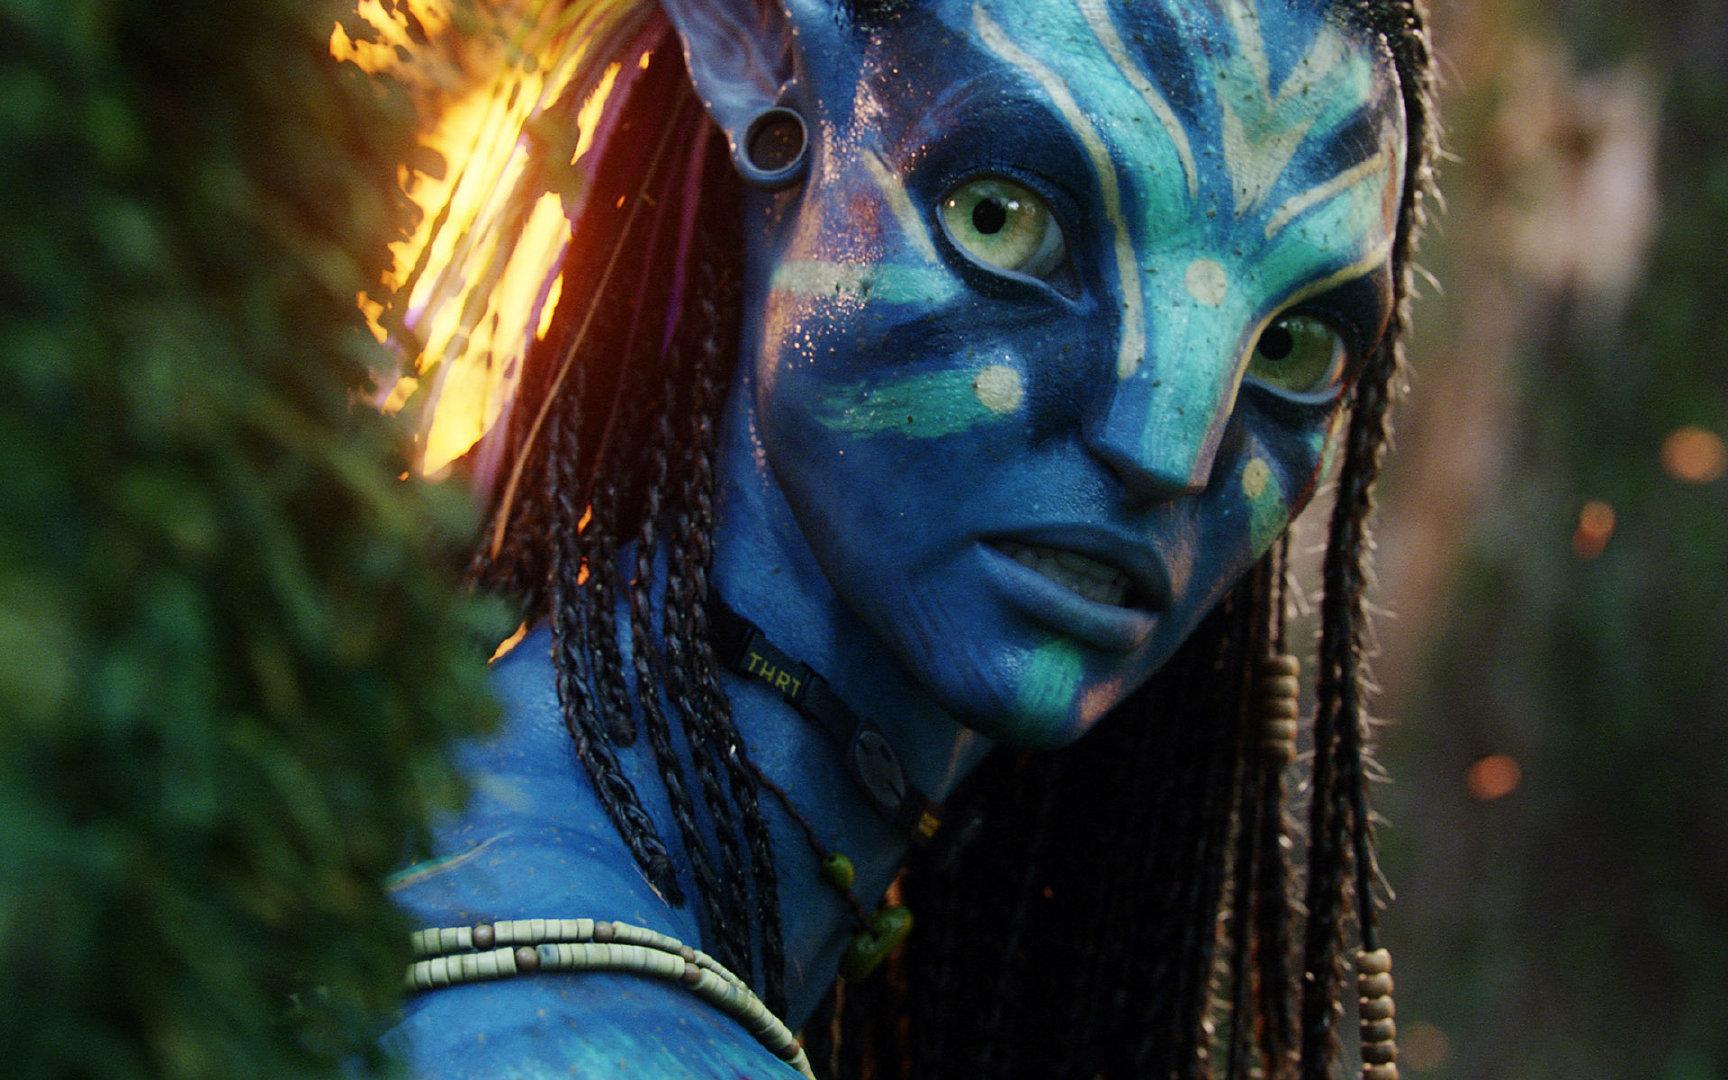 Avatar阿凡达 第一辑2K超高清壁纸图片